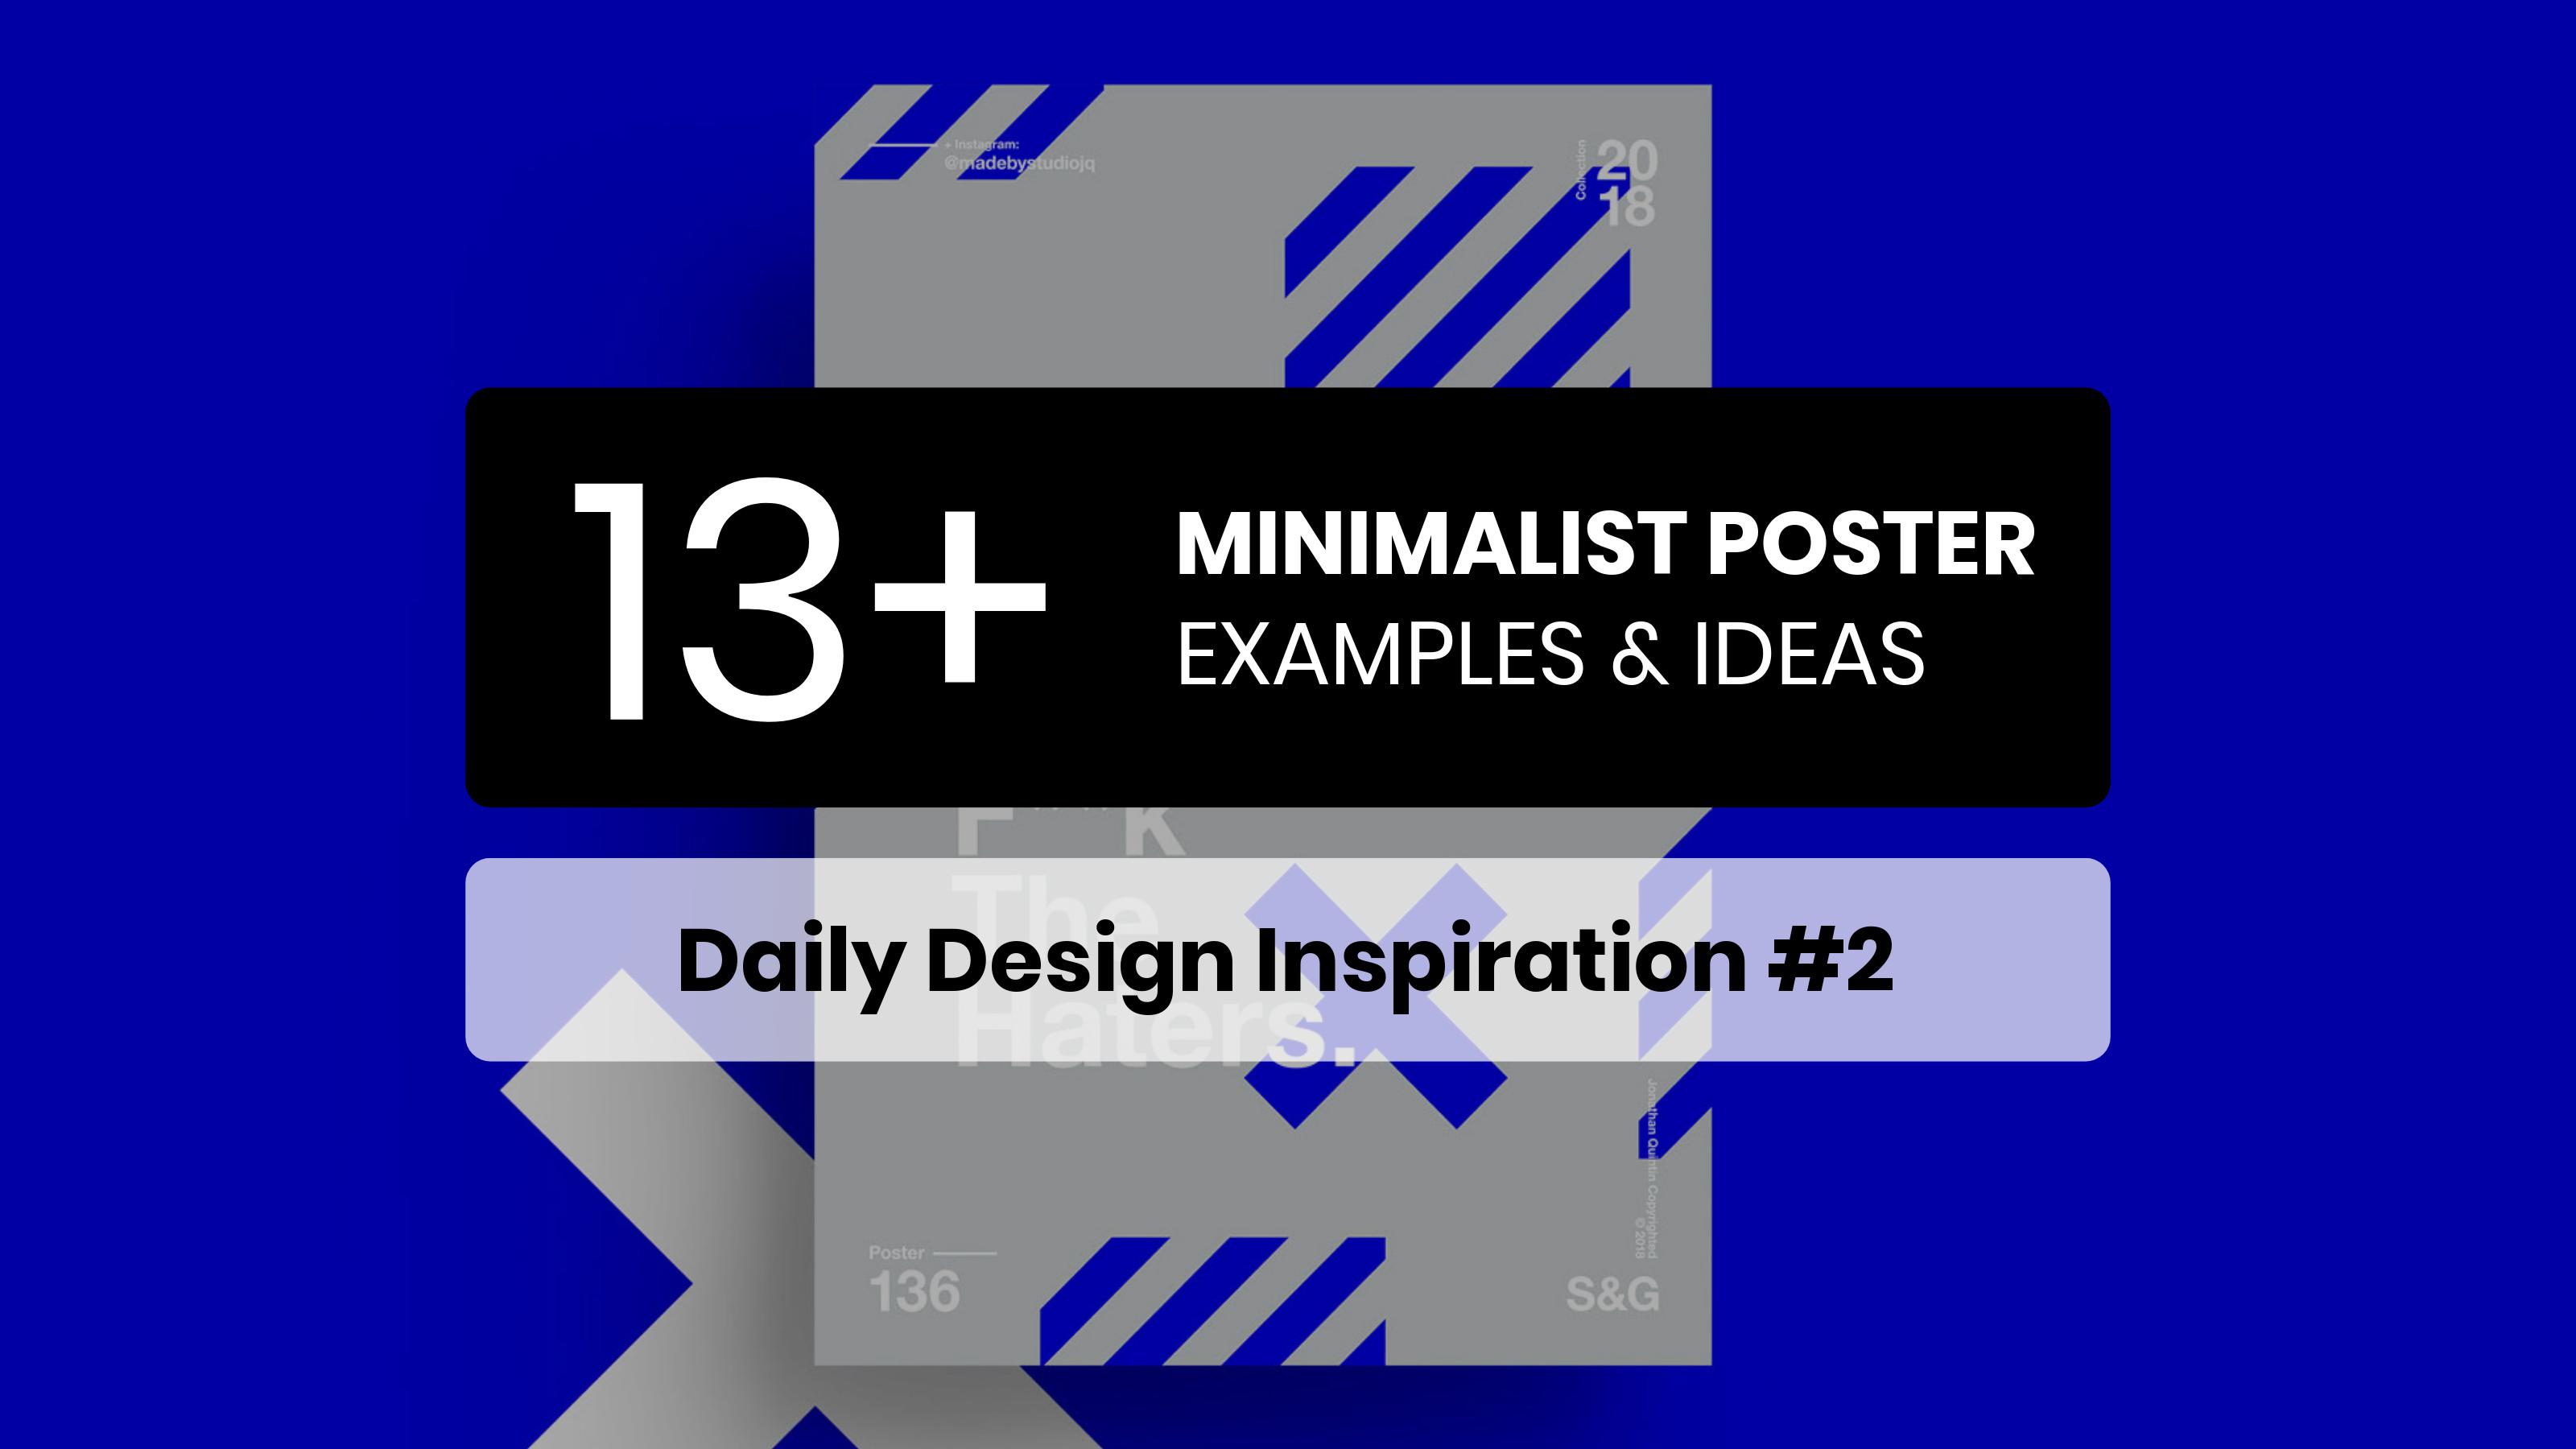 13 Minimalist Poster Examples & Templates